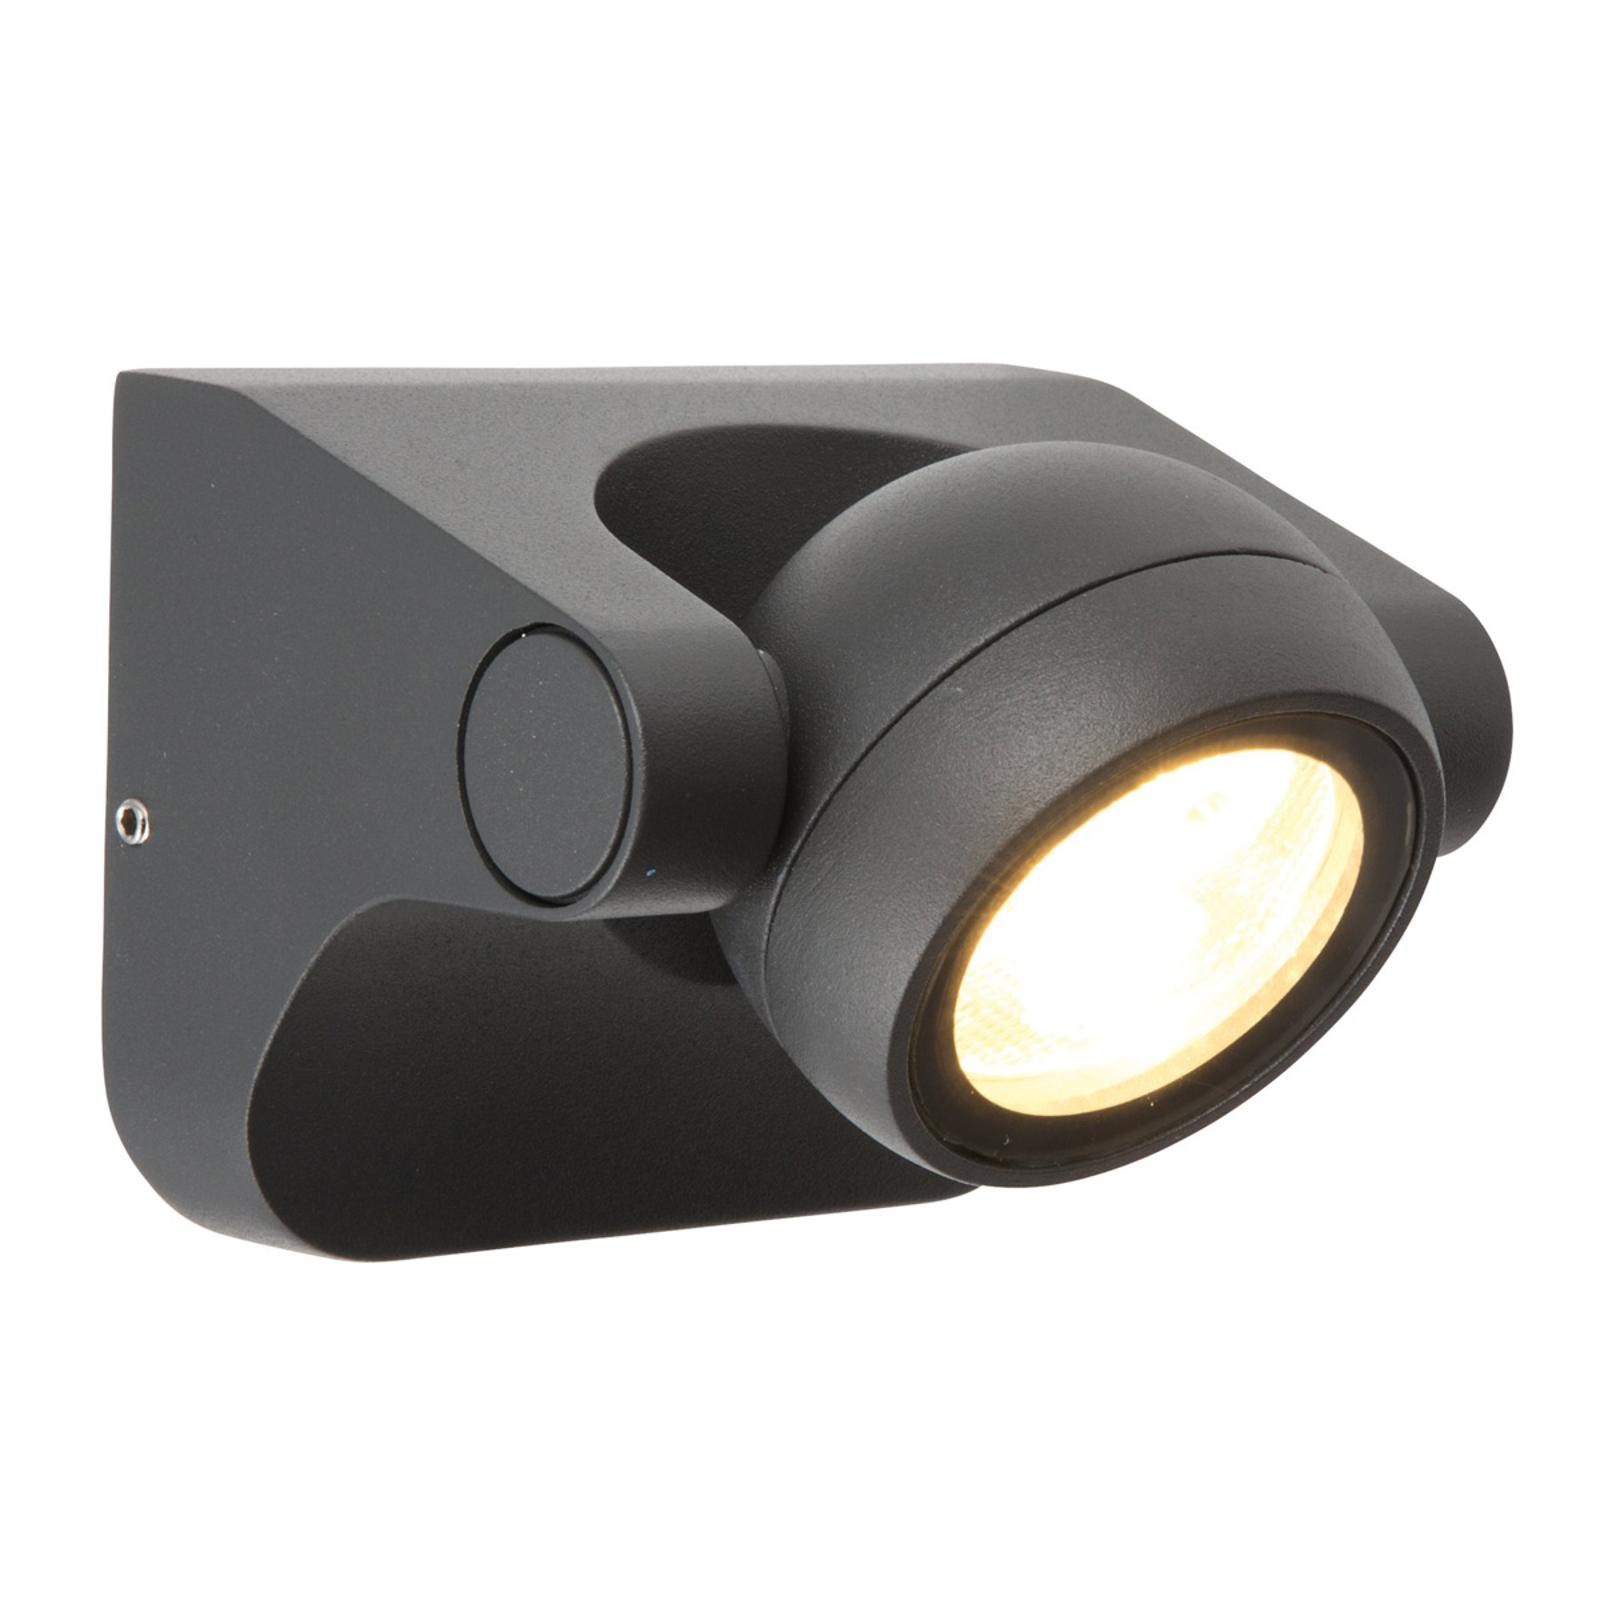 Richtbare Led-buitenwandlamp Larry